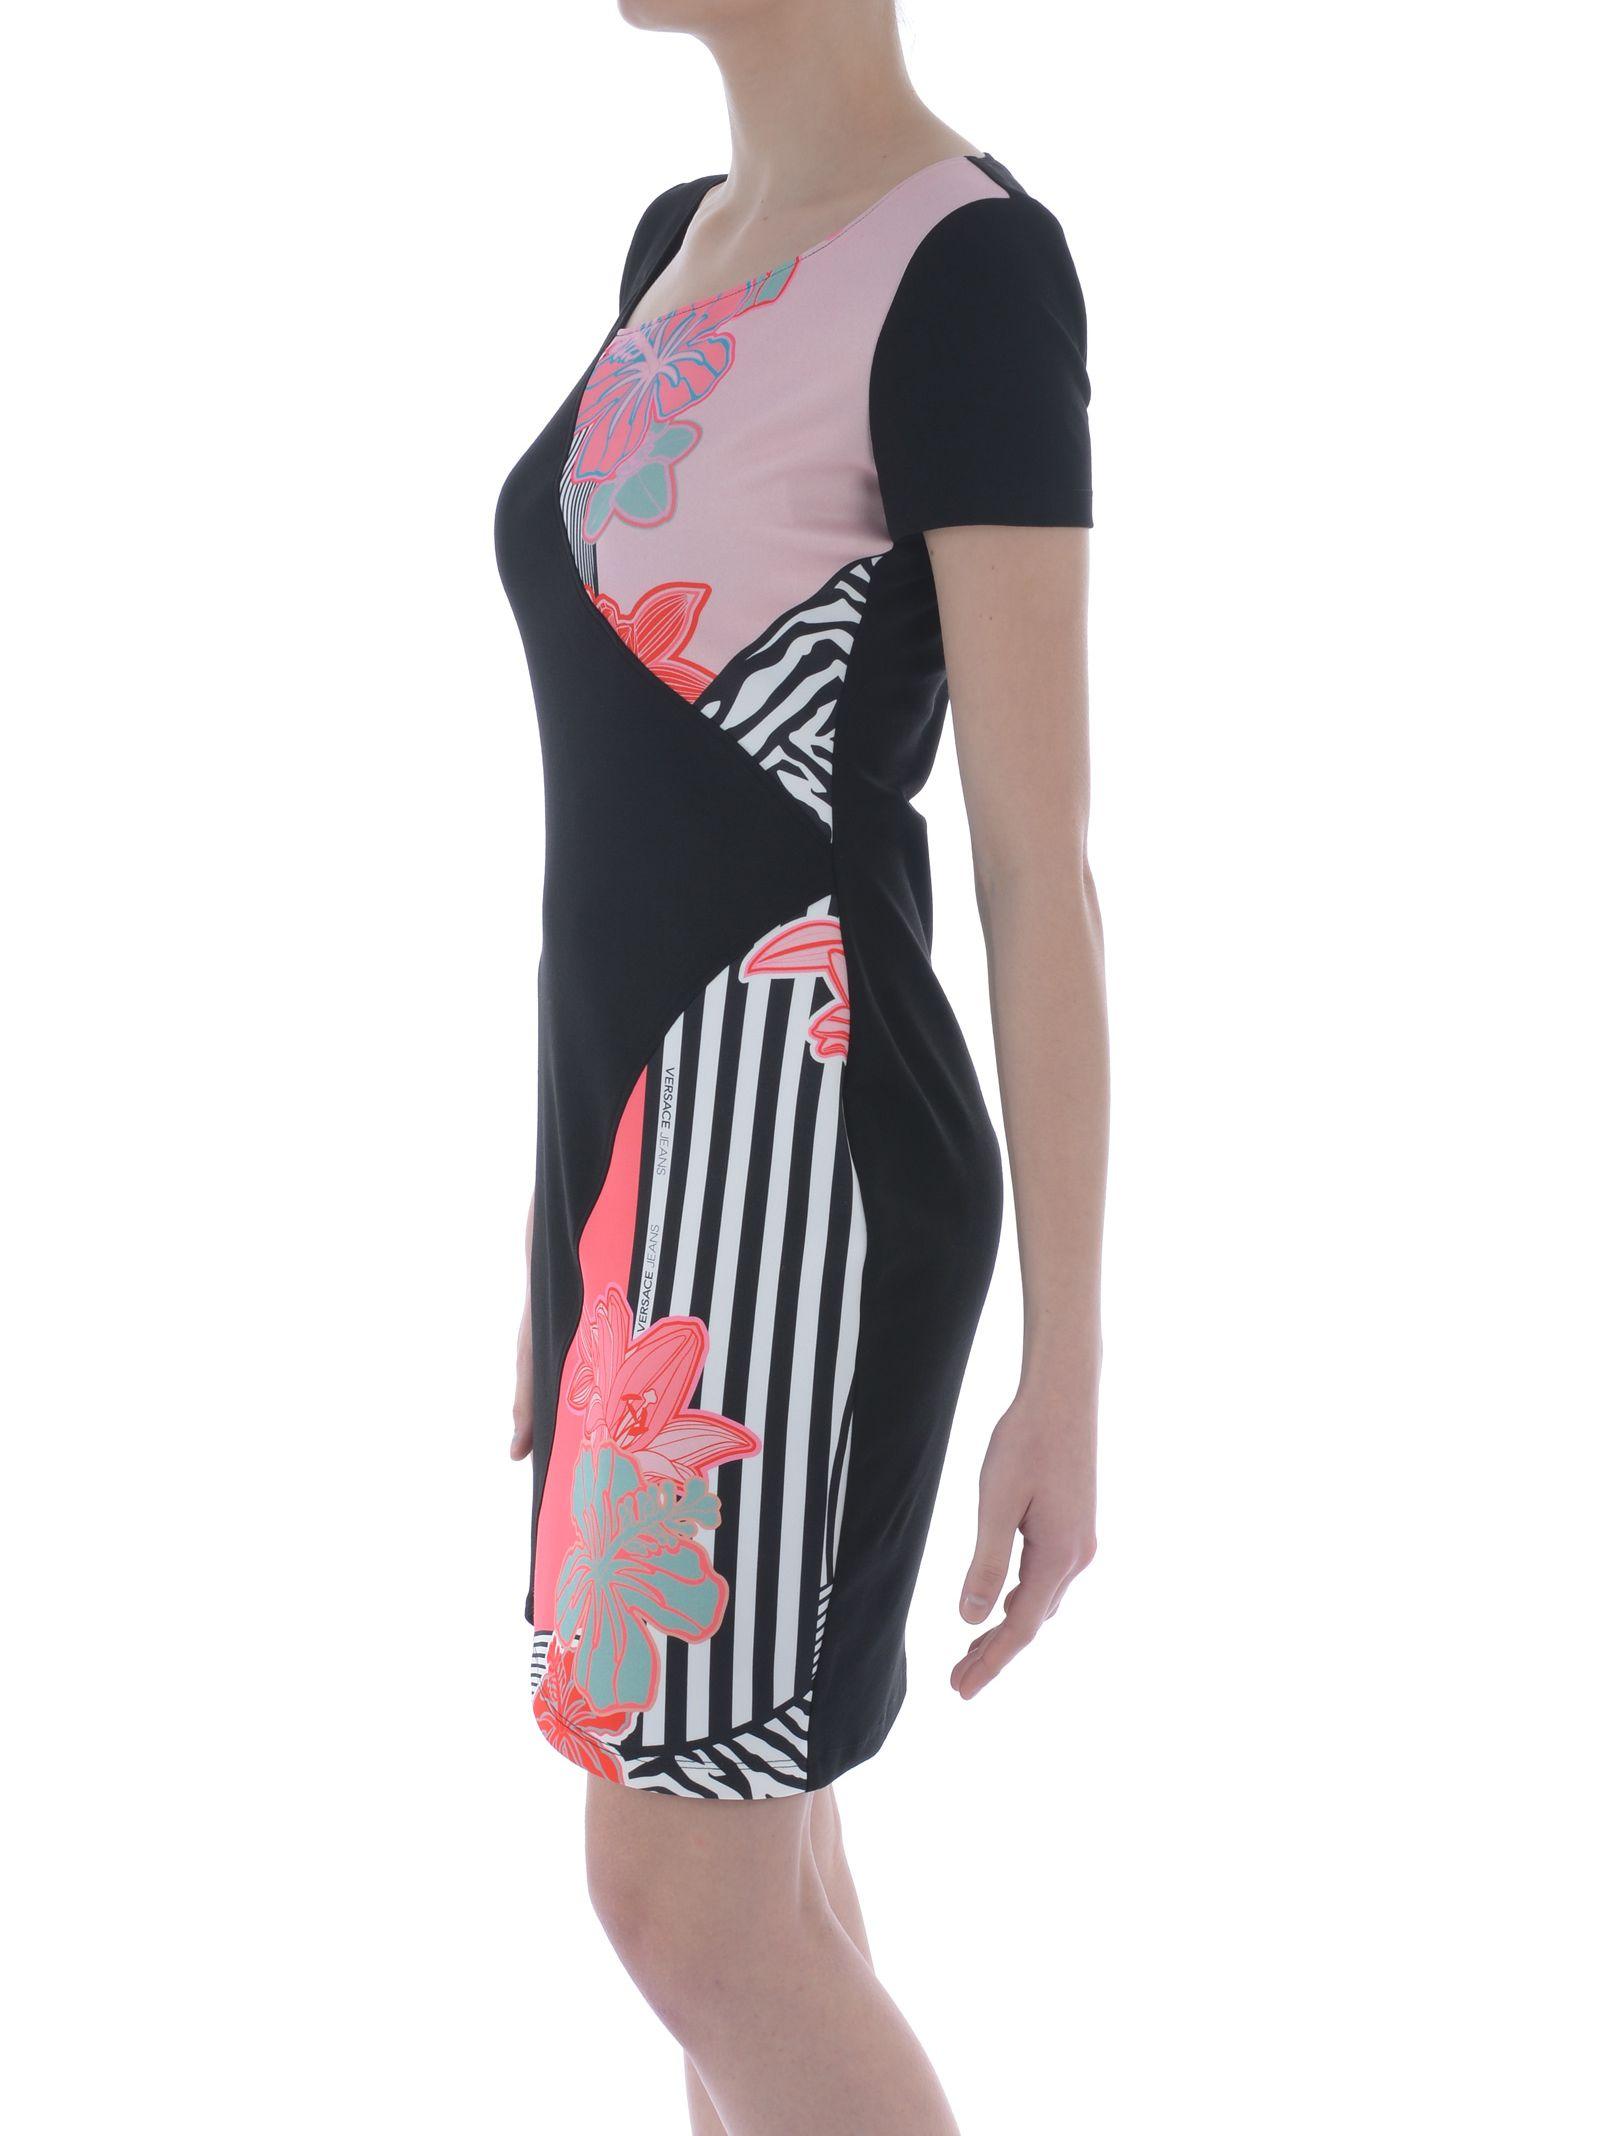 7ed817bc9 versace chain t shirt sale   OFF55% Discounts